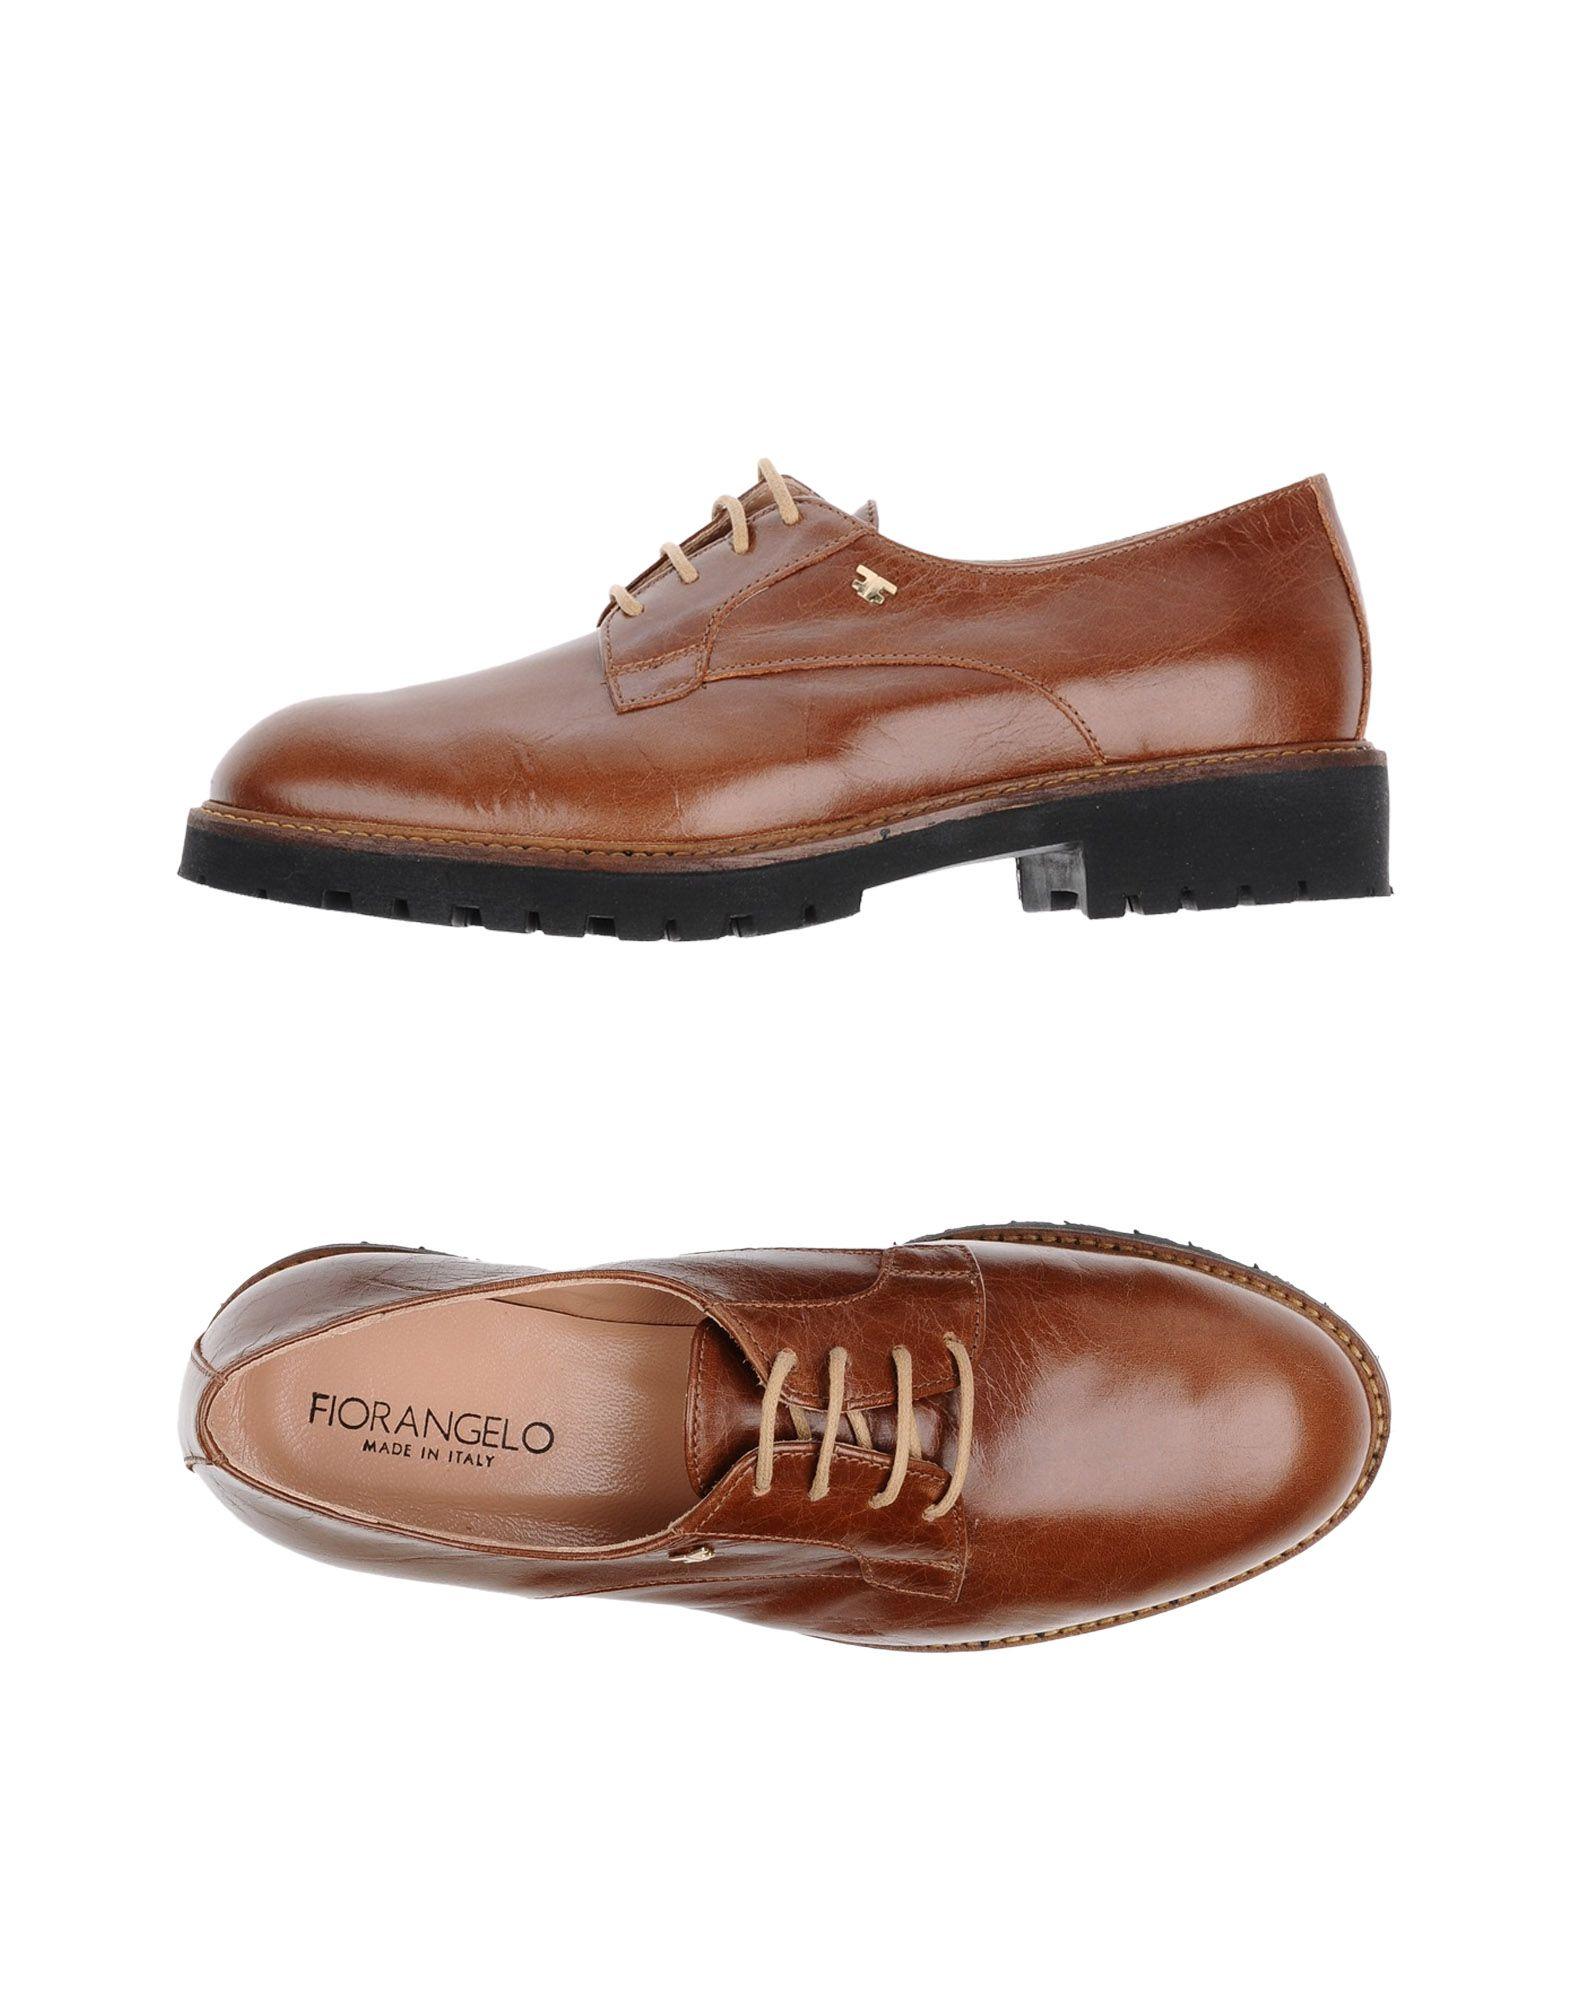 Fiorangelo Schnürschuhe Damen  11291387TV Gute Qualität beliebte Schuhe